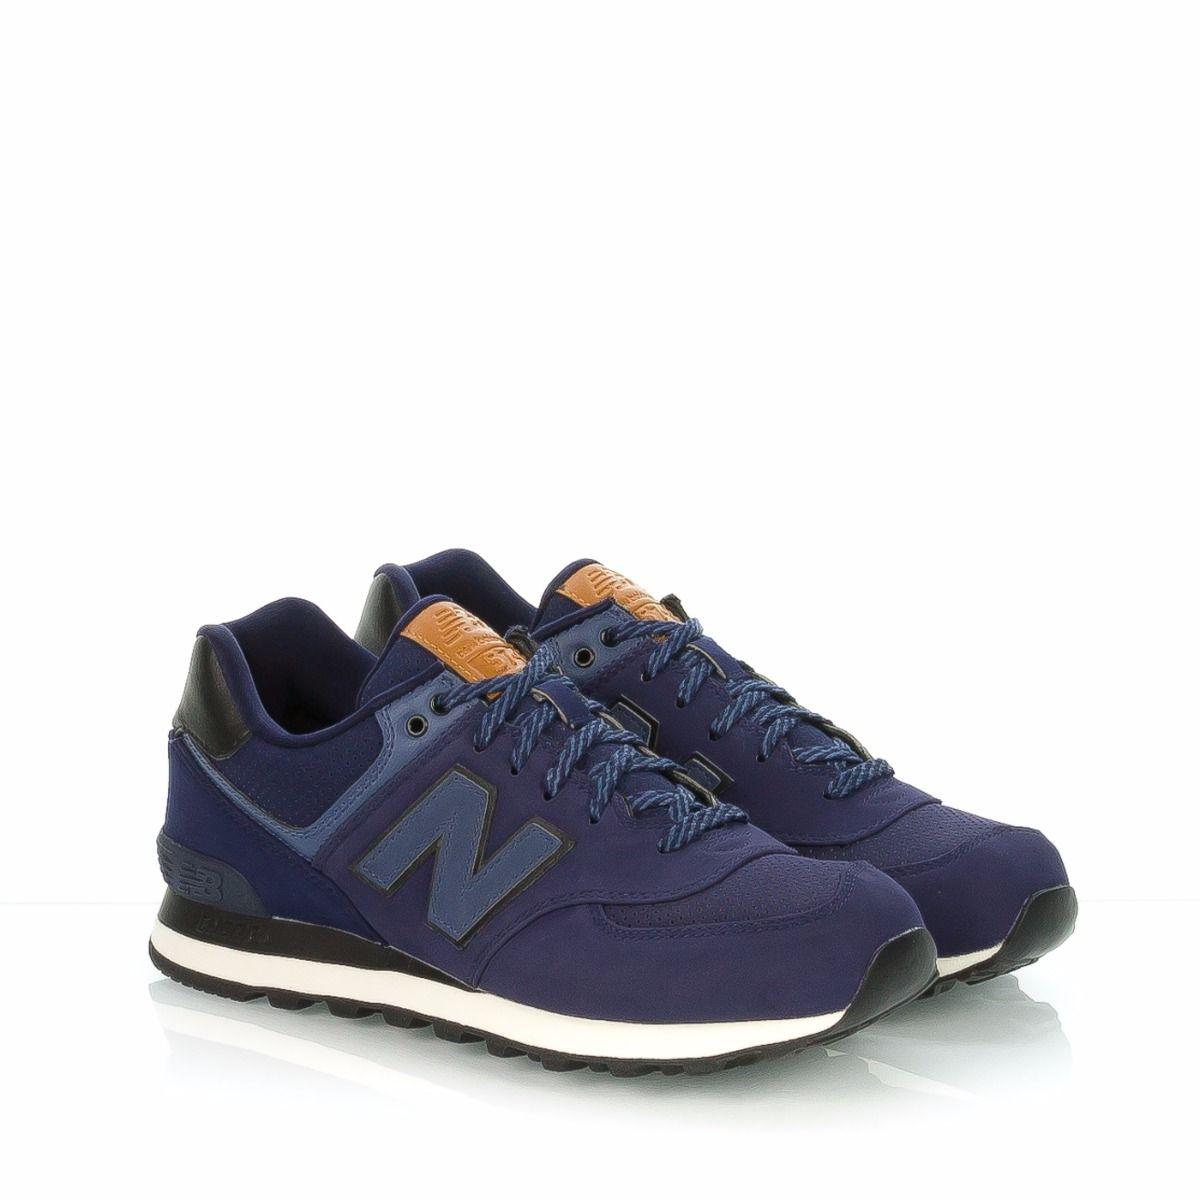 new balance uomo shop online